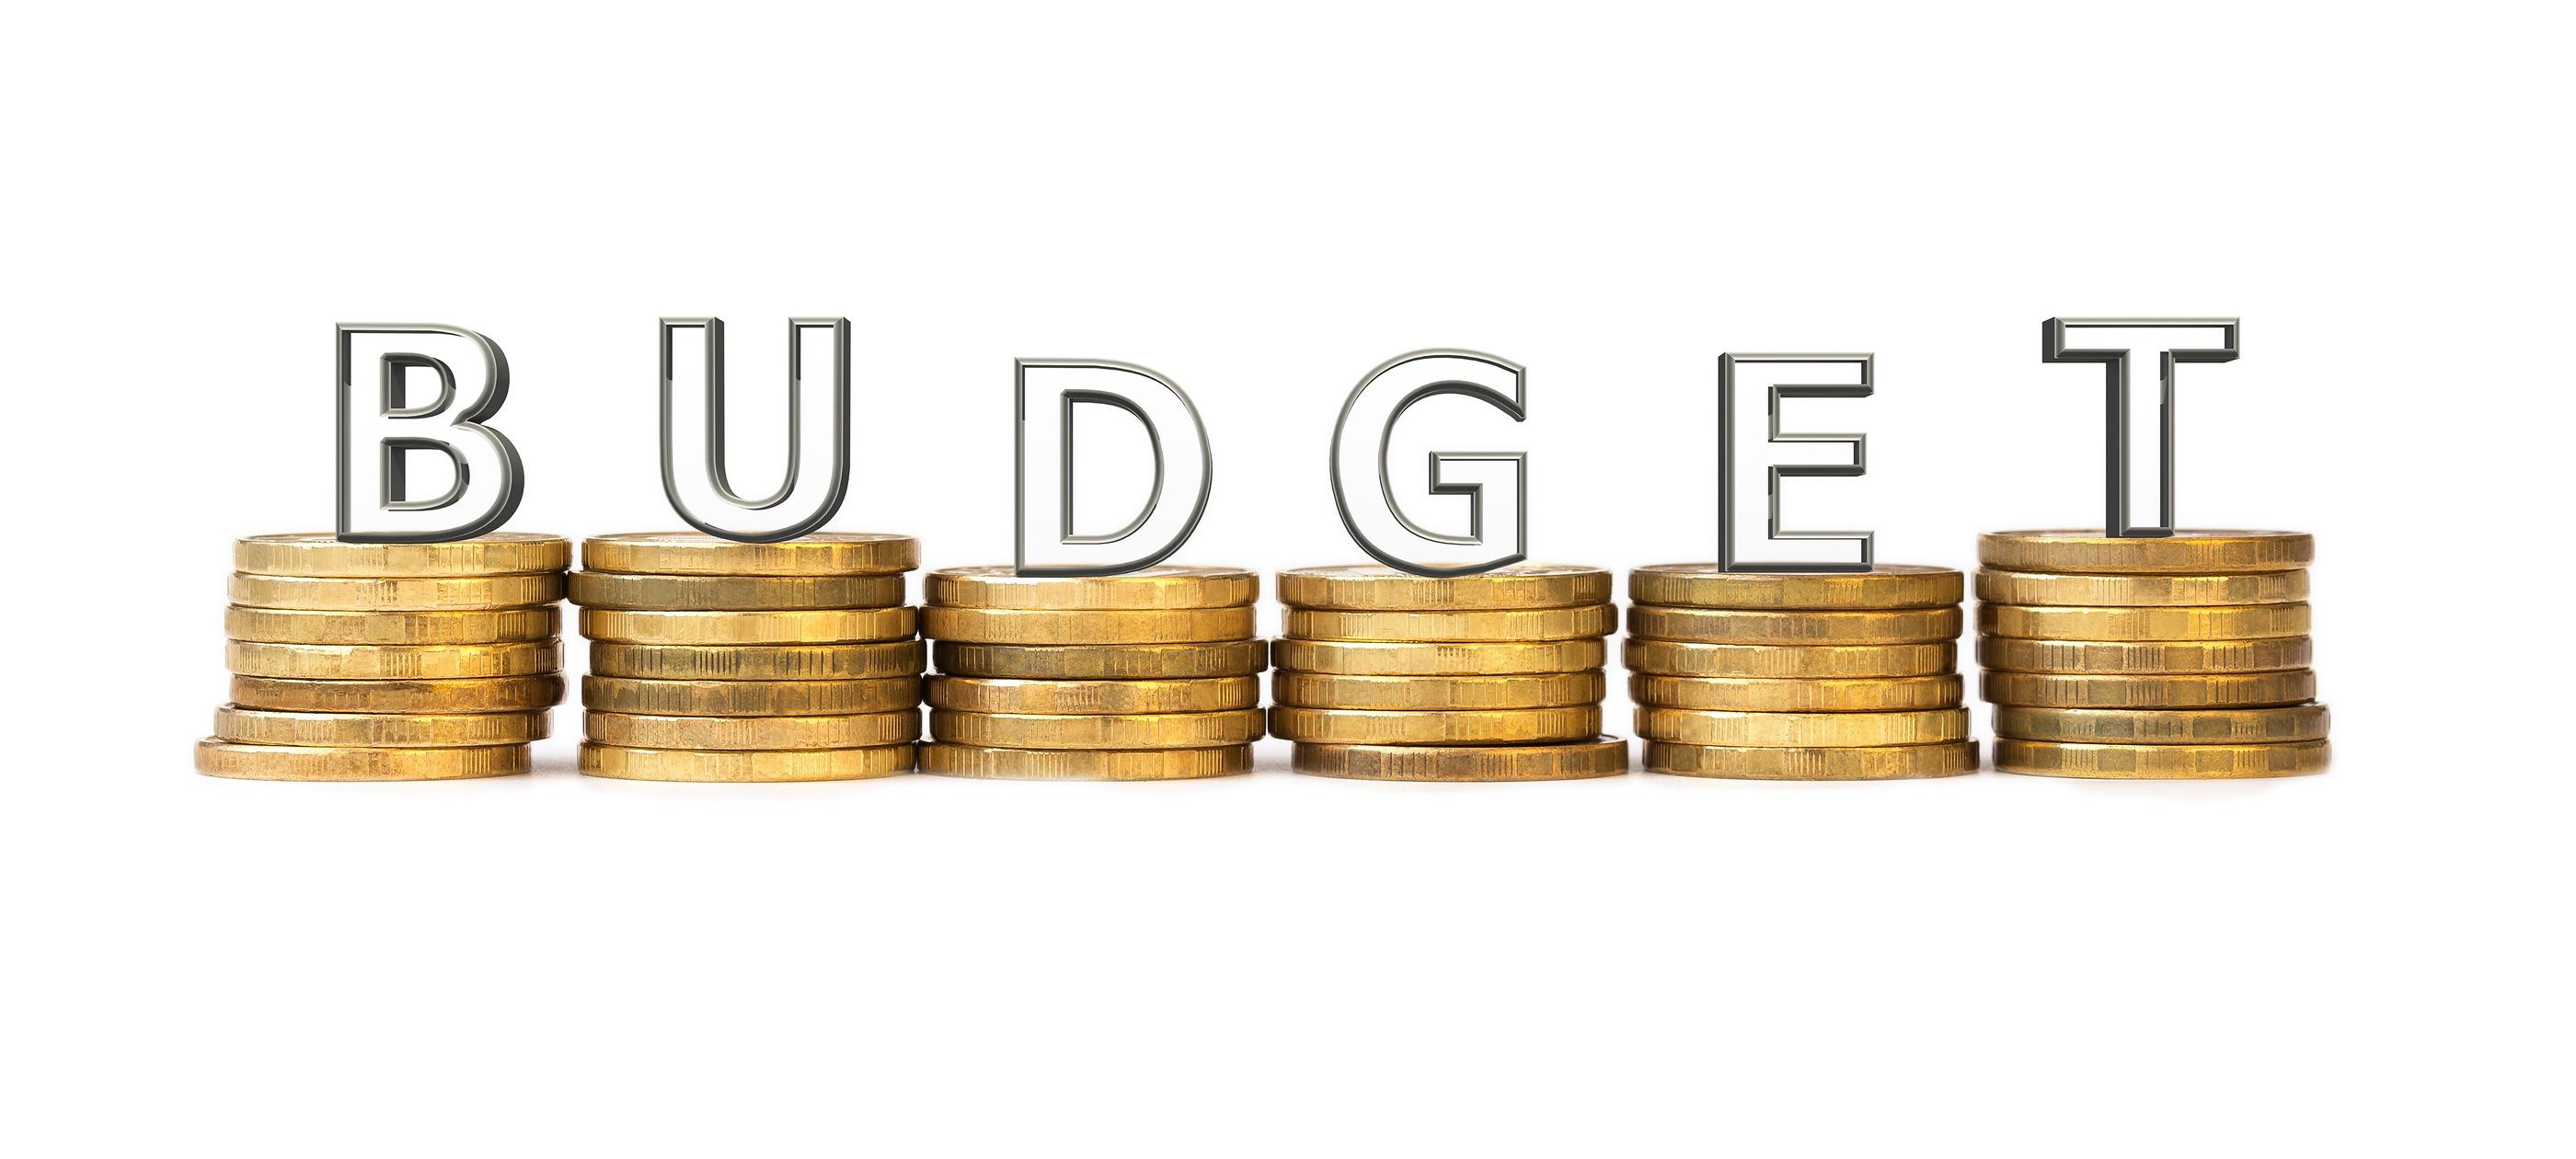 bigstock-Budget-Financial-Cost-Finan-228632674